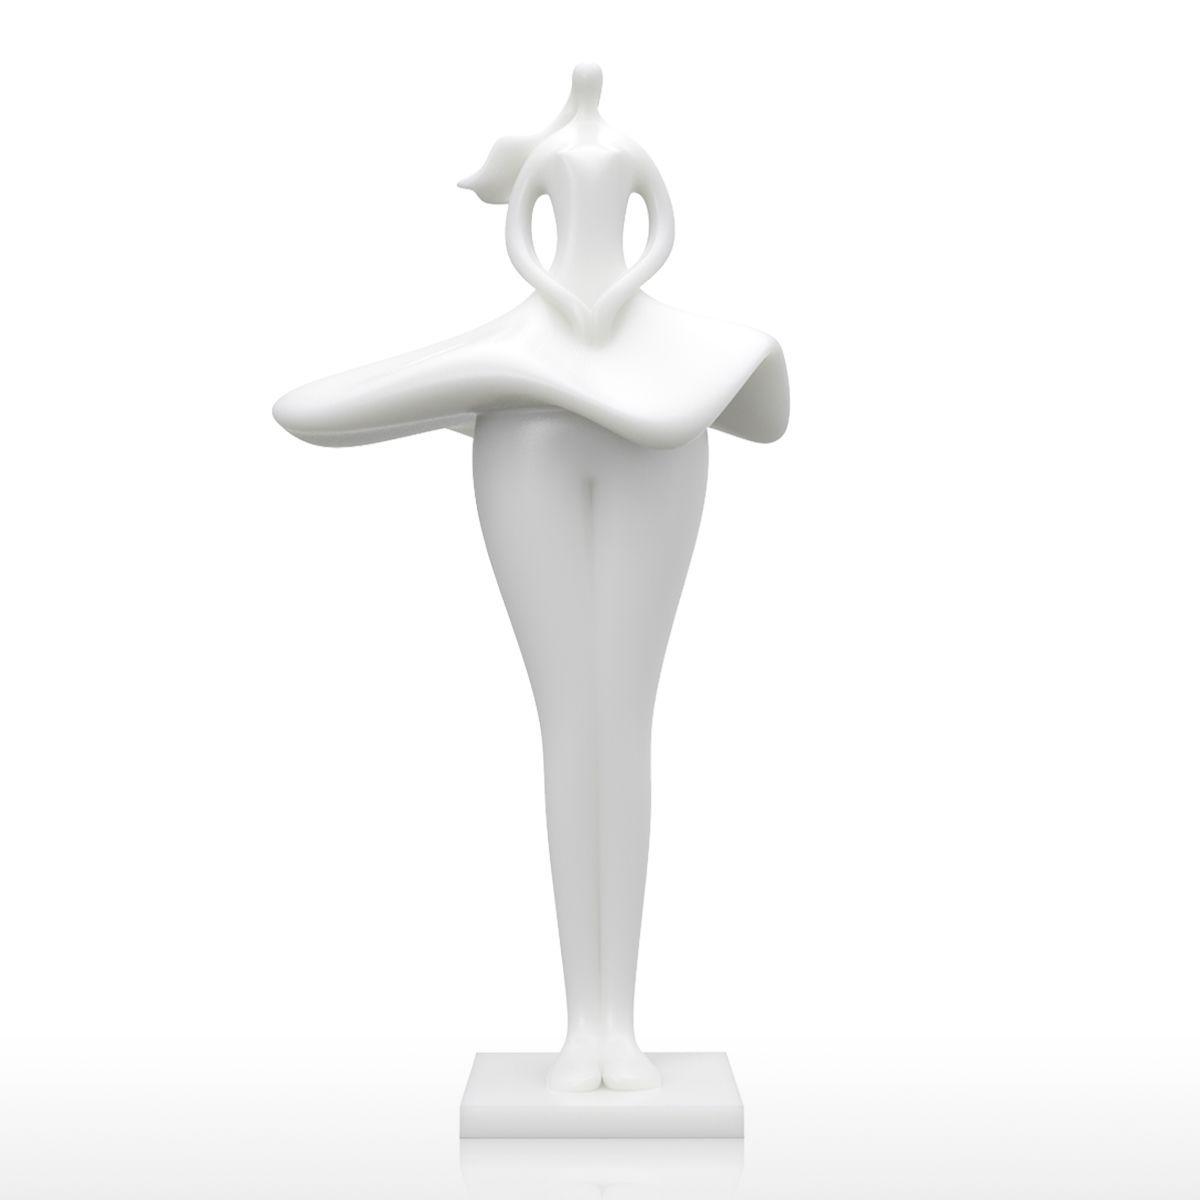 Tooarts Skirt Girl 3D Printed Sculpture Elegant Model Miniatures Art Modern  Sculpture Accessories Artwork For Home Office